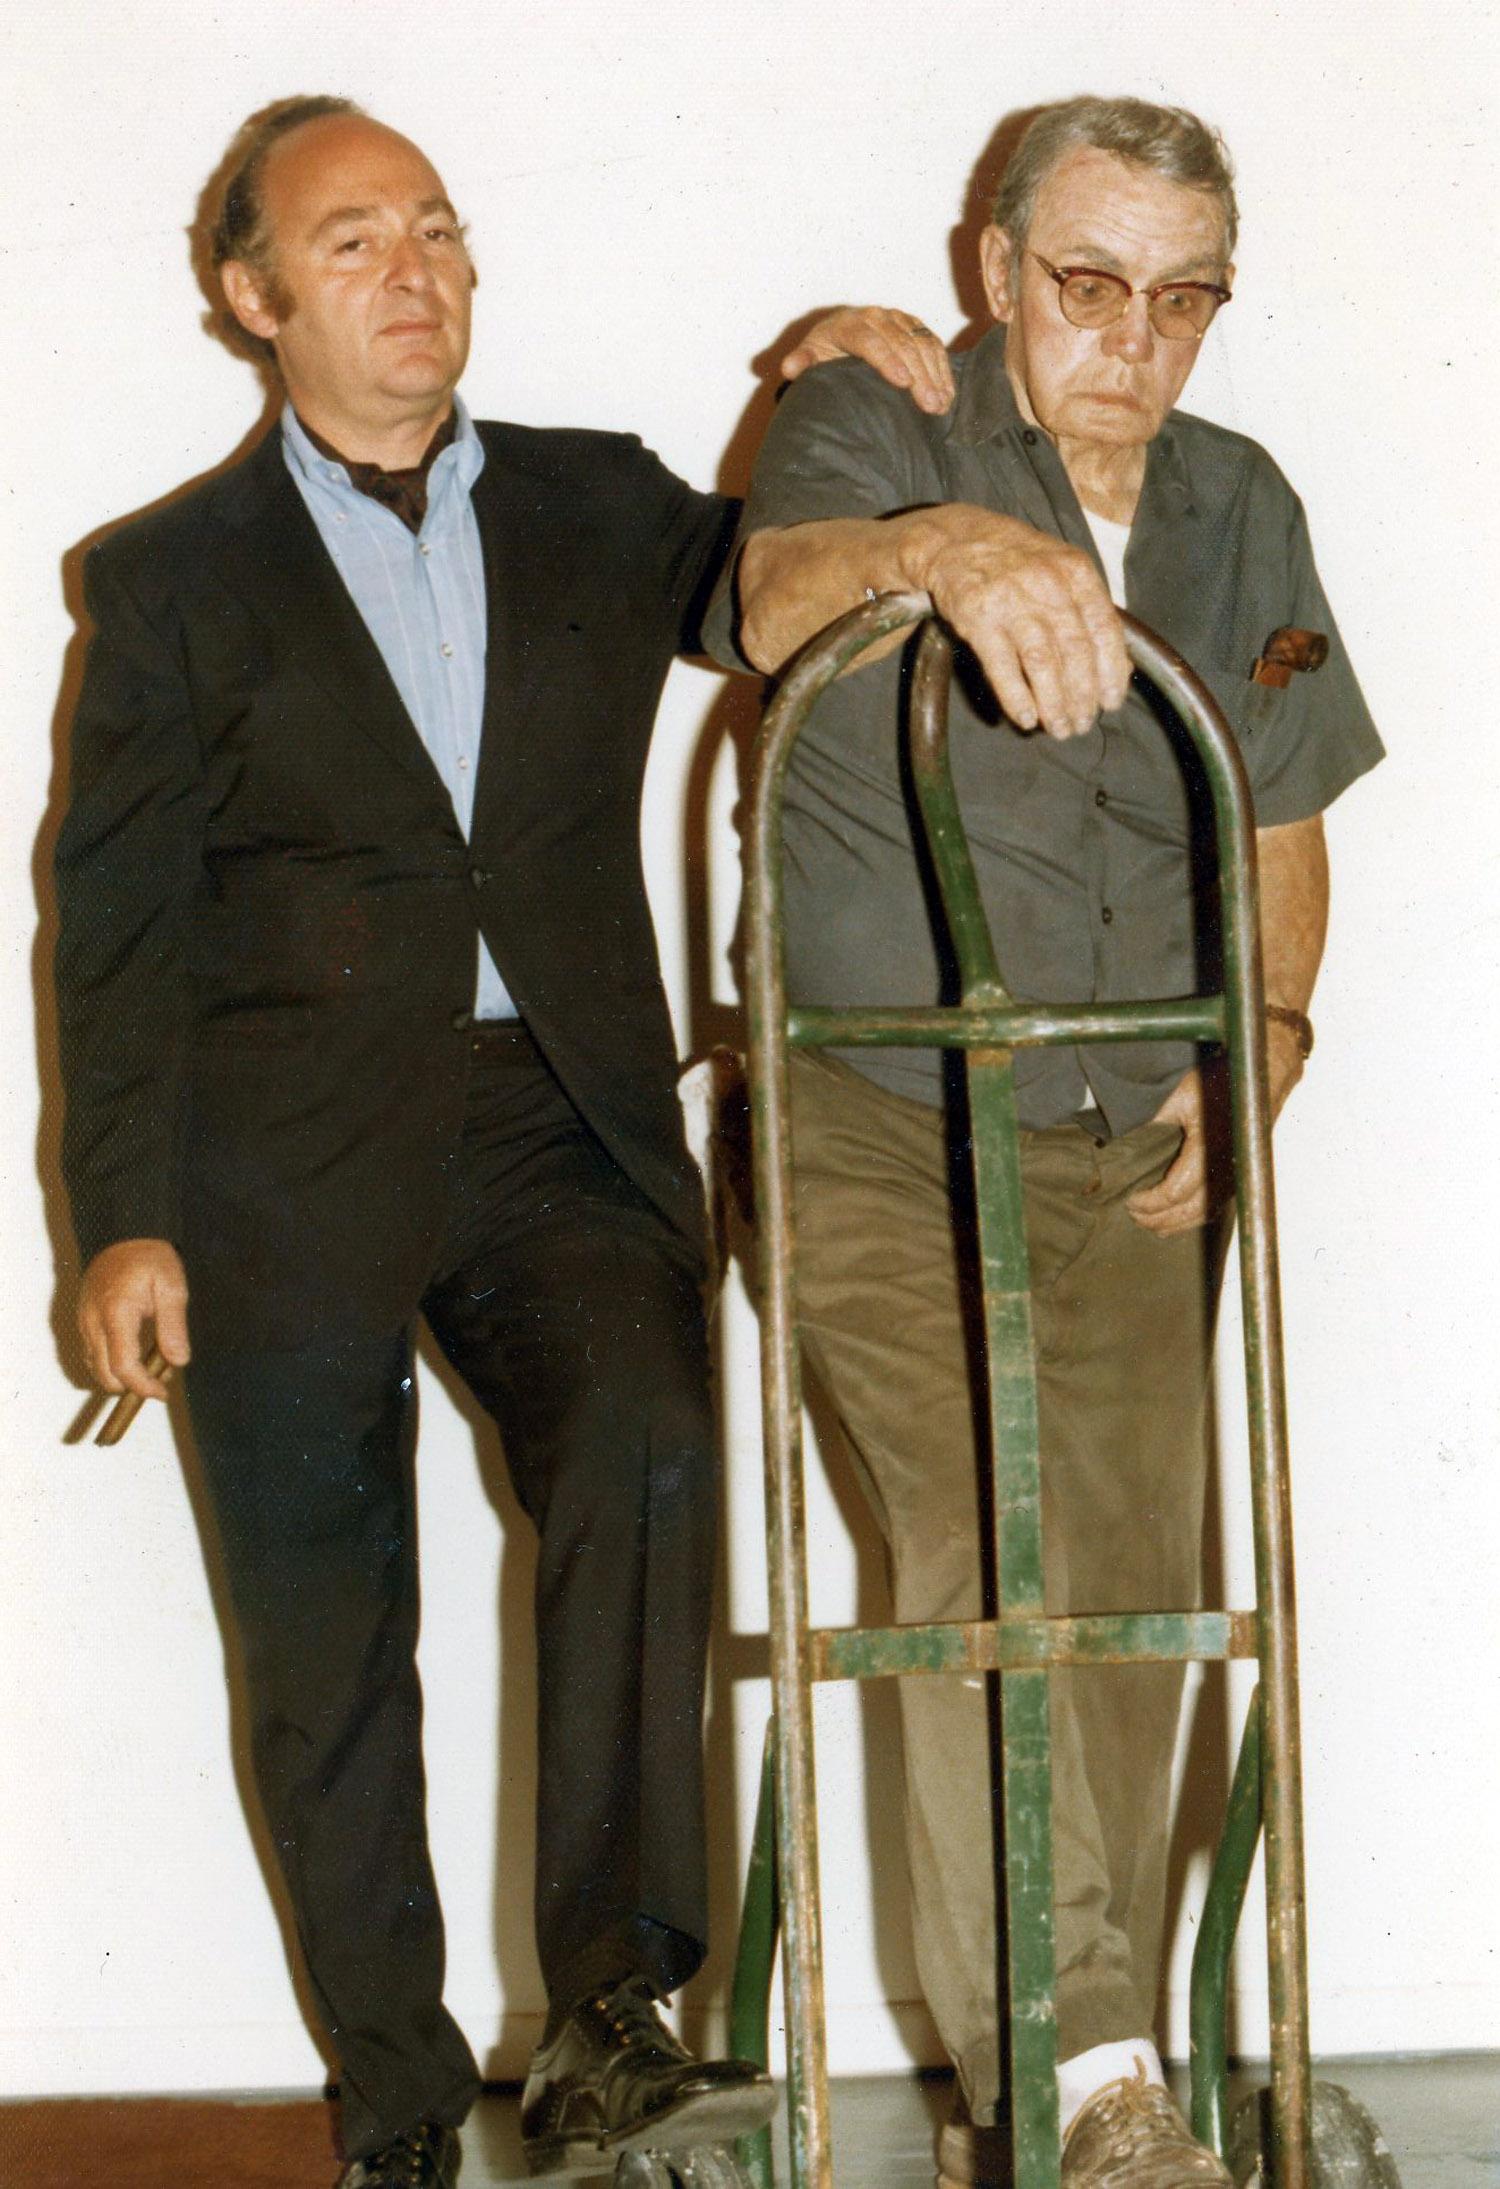 Ivan Karp of OK Harris with Duane Hanson sculpture, 1975